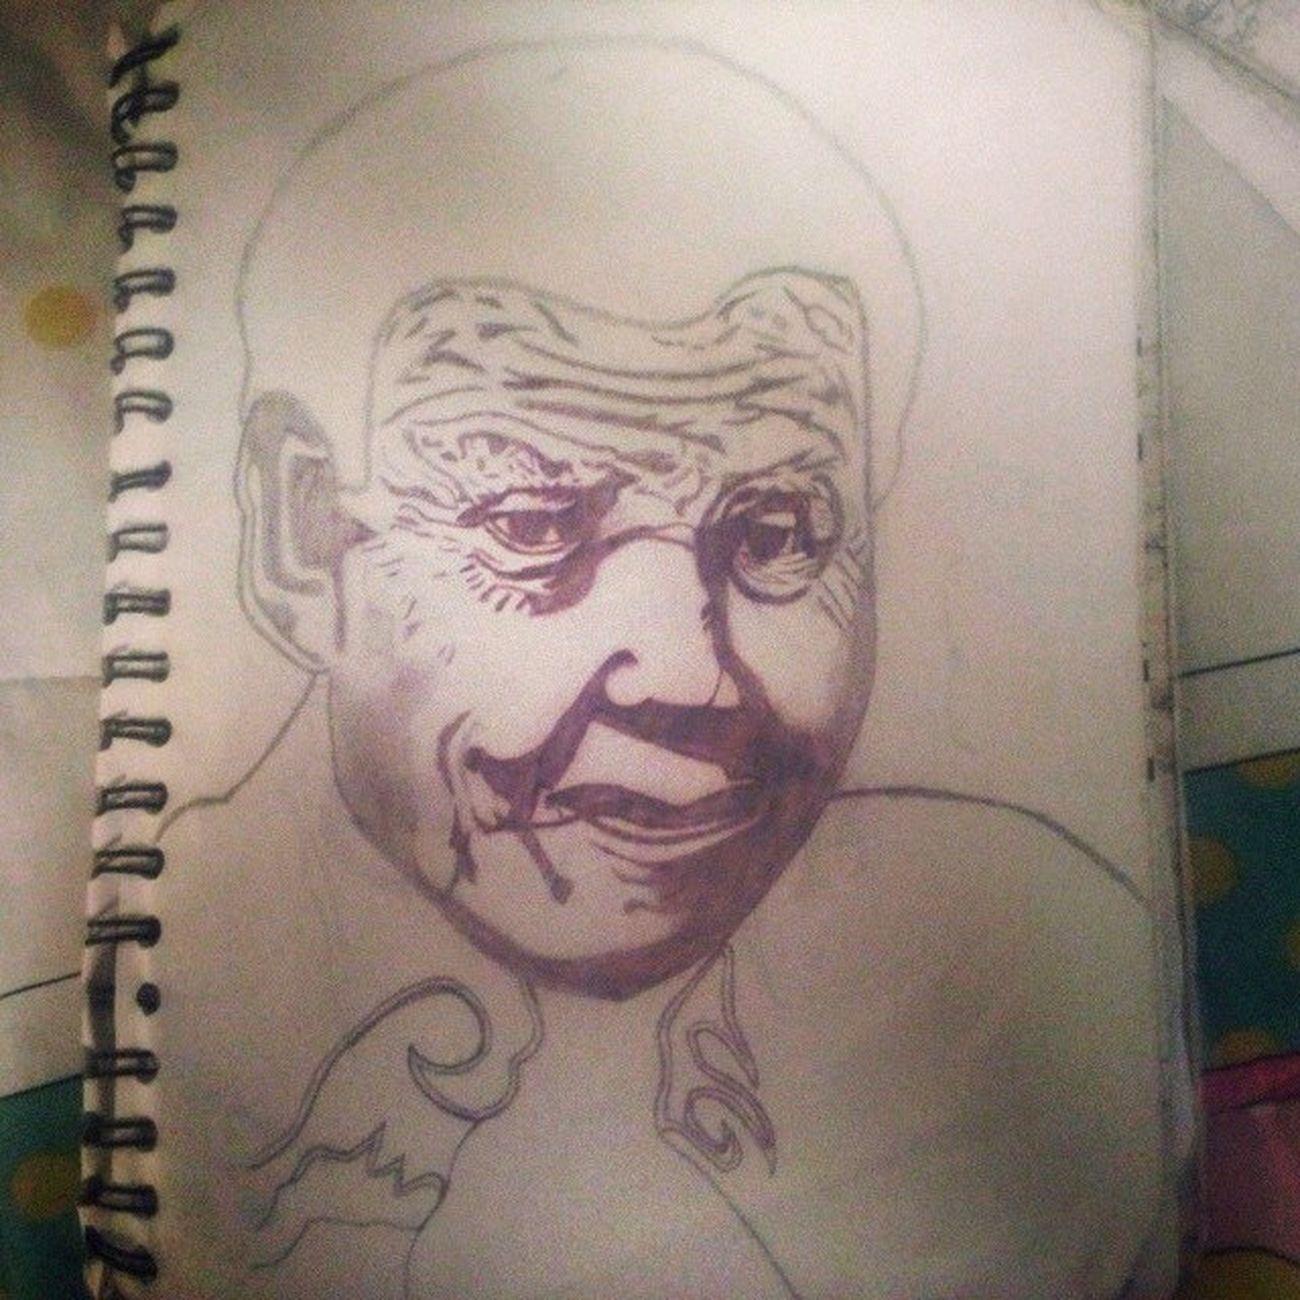 La Mente Detras Del Lapiz Dibujo A Lapiz Art, Drawing, Creativity Drawingtime Mis Dibujos Dibujo Drawing Artistic Arte ArtWork